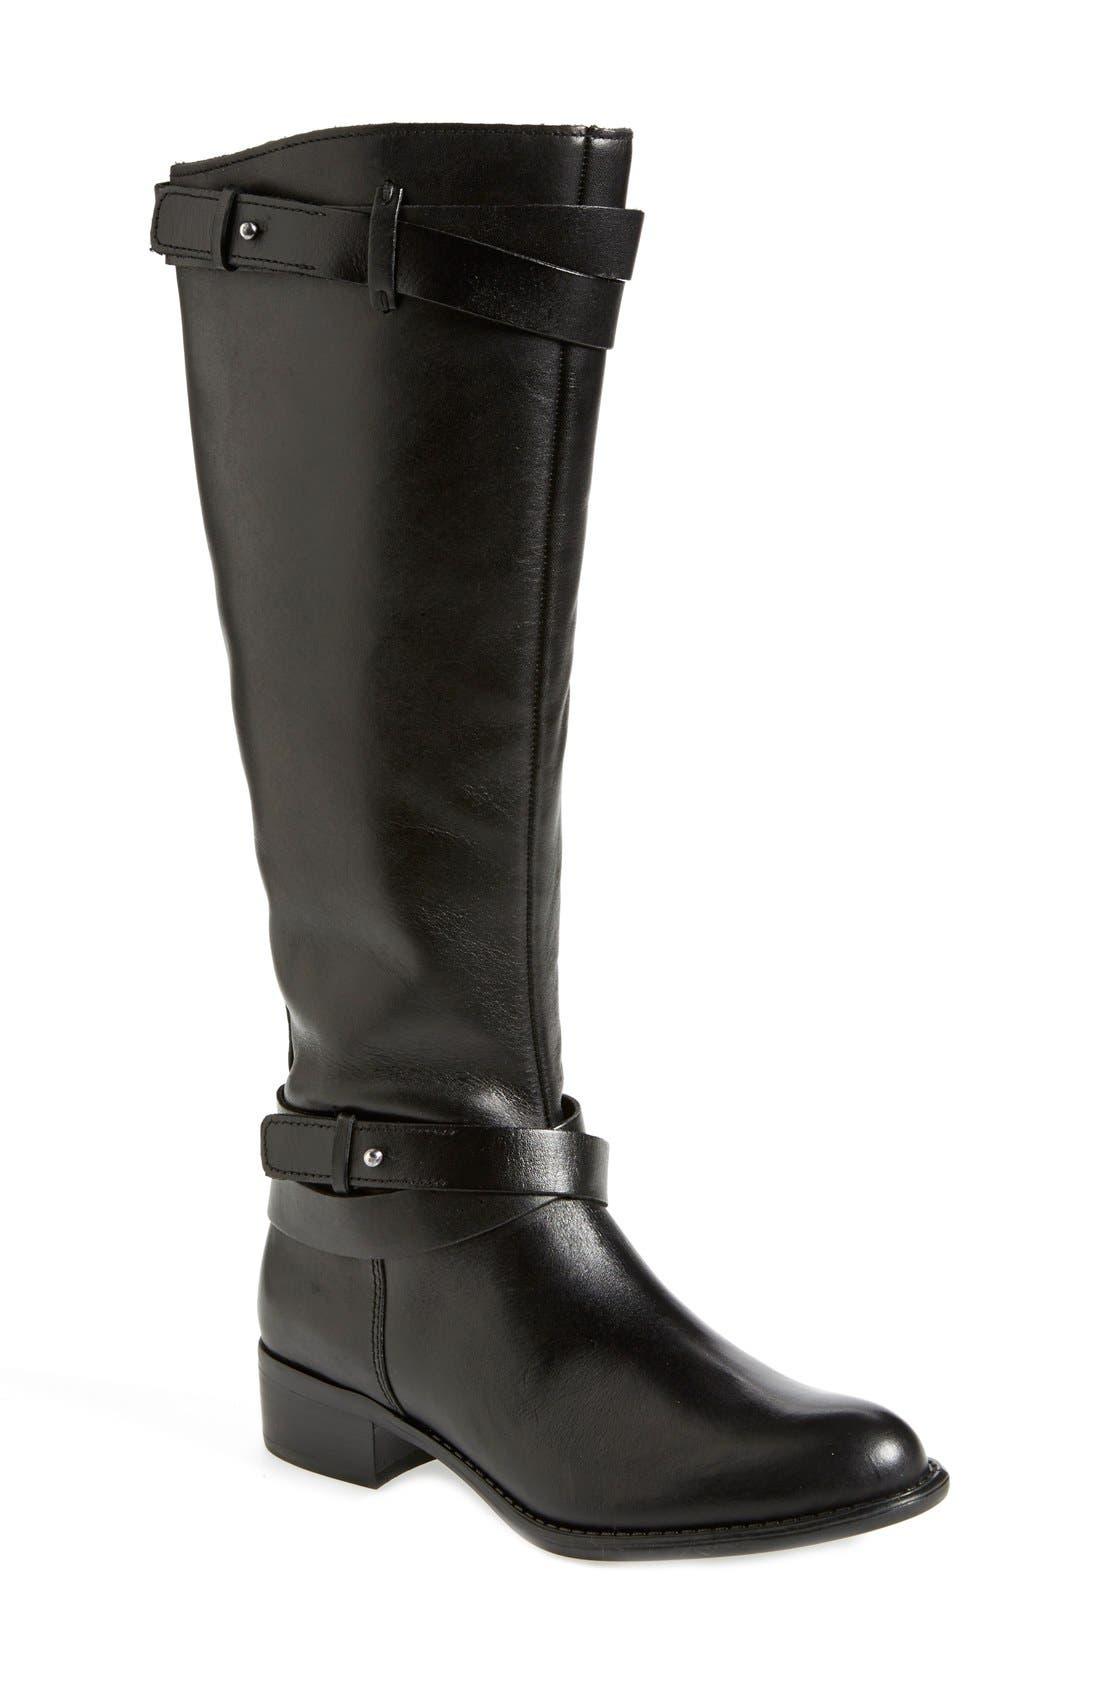 FRANCO SARTO 'Canary' Leather Riding Boot, Main, color, 001